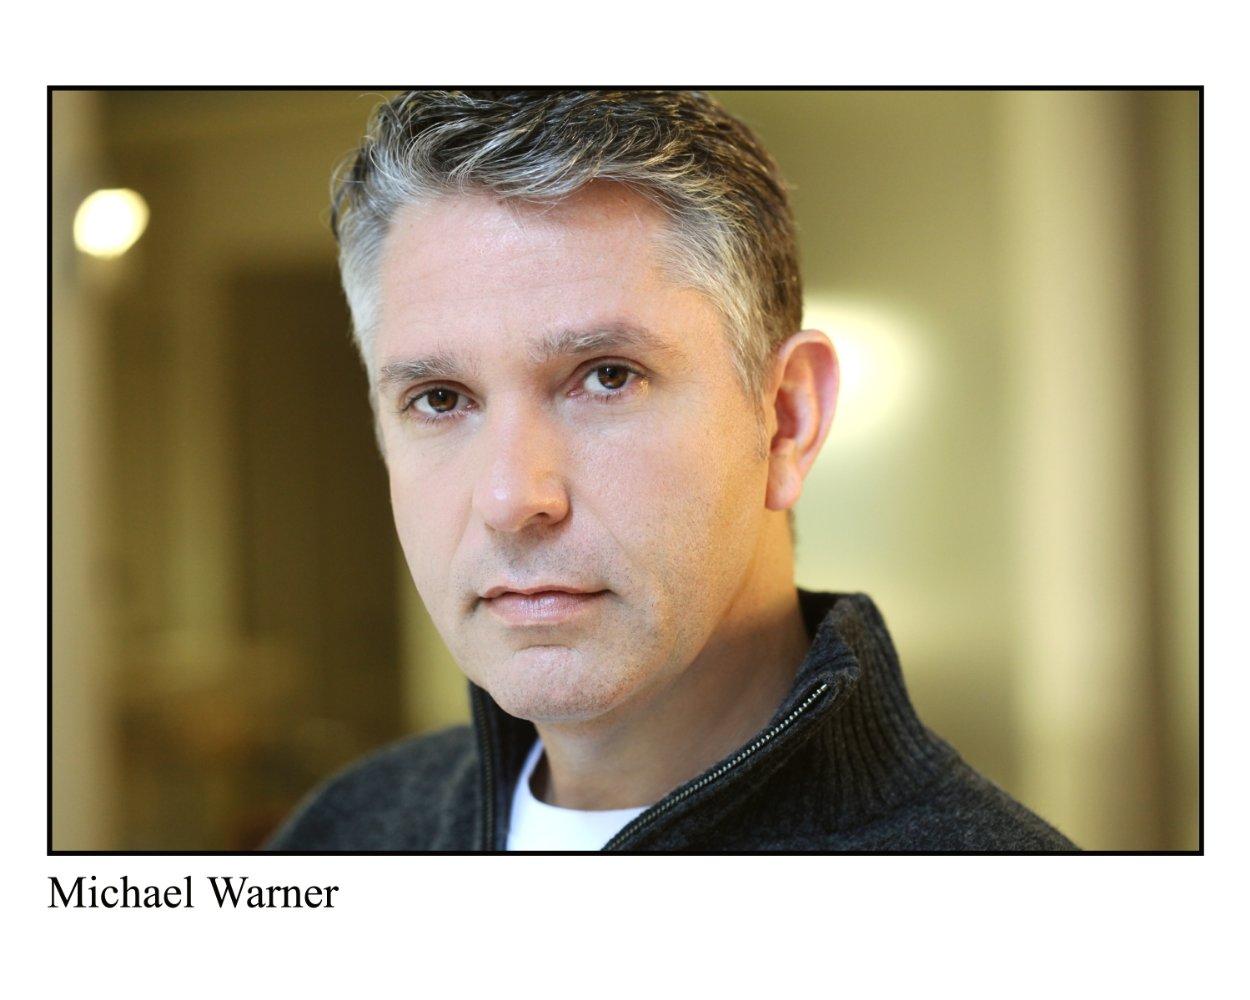 Michael Warner